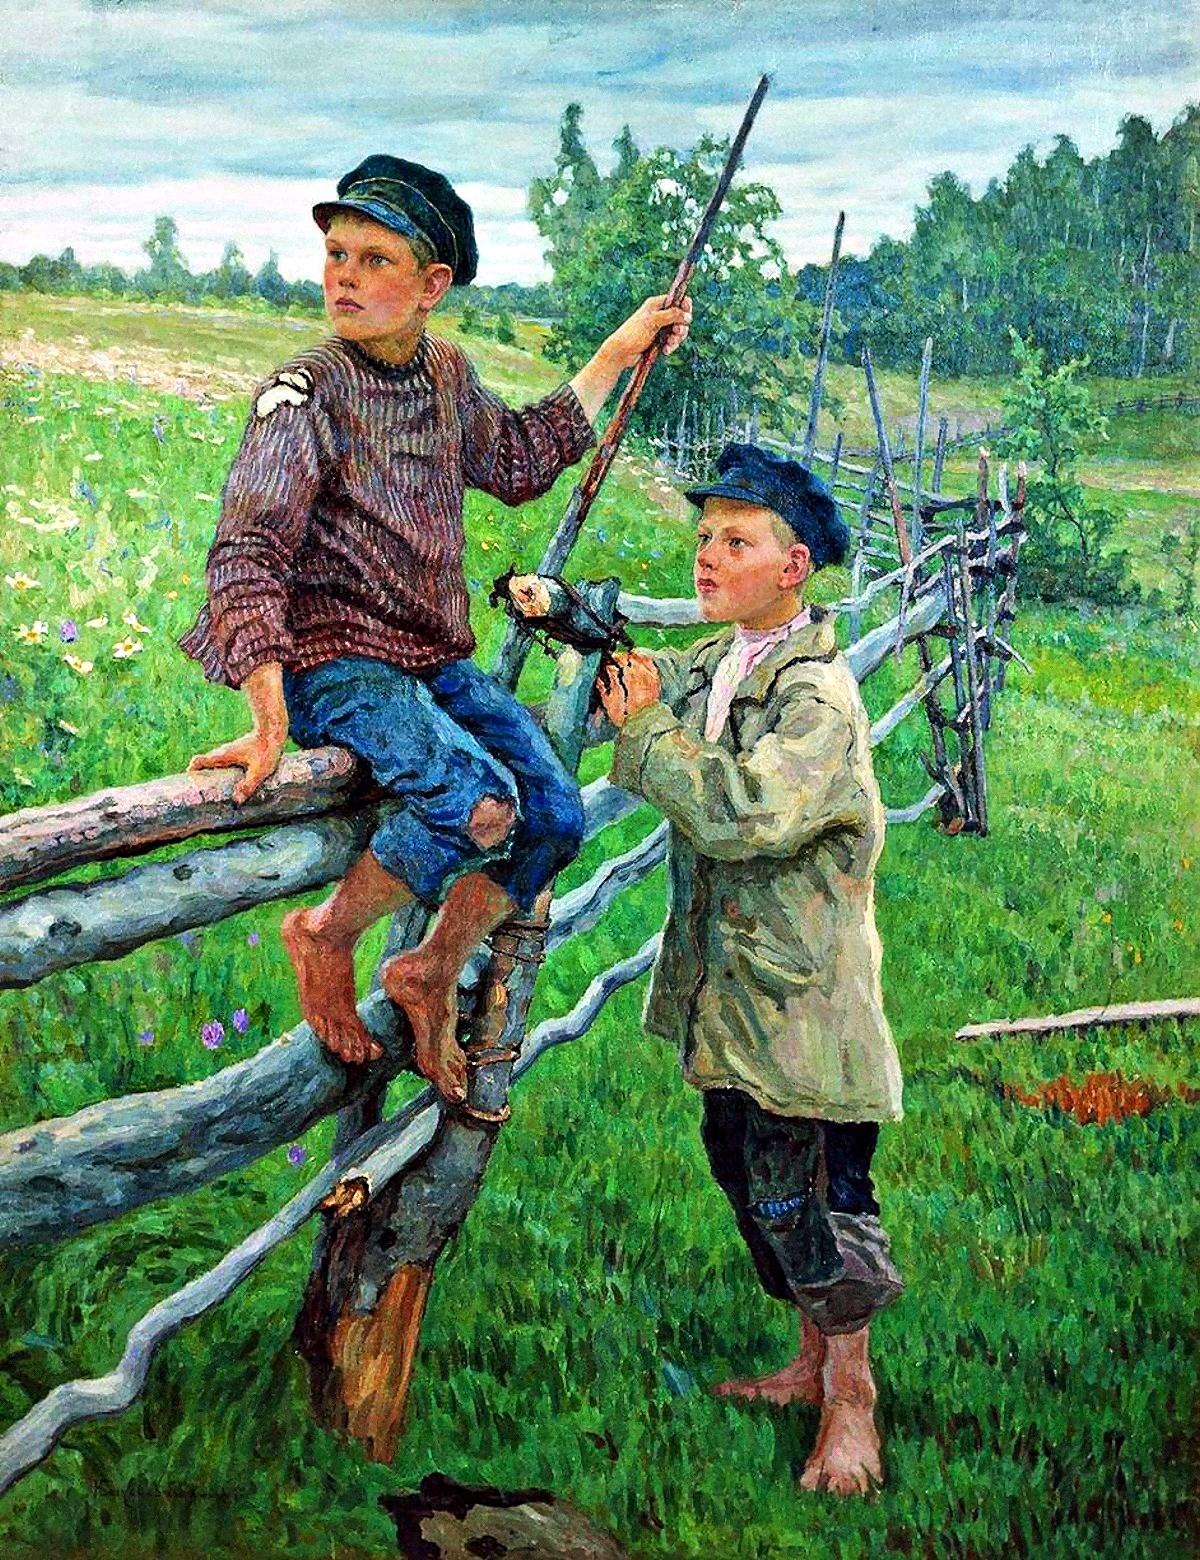 00 Nikolai Bogdanov-Belsky. Village Kids. 1936